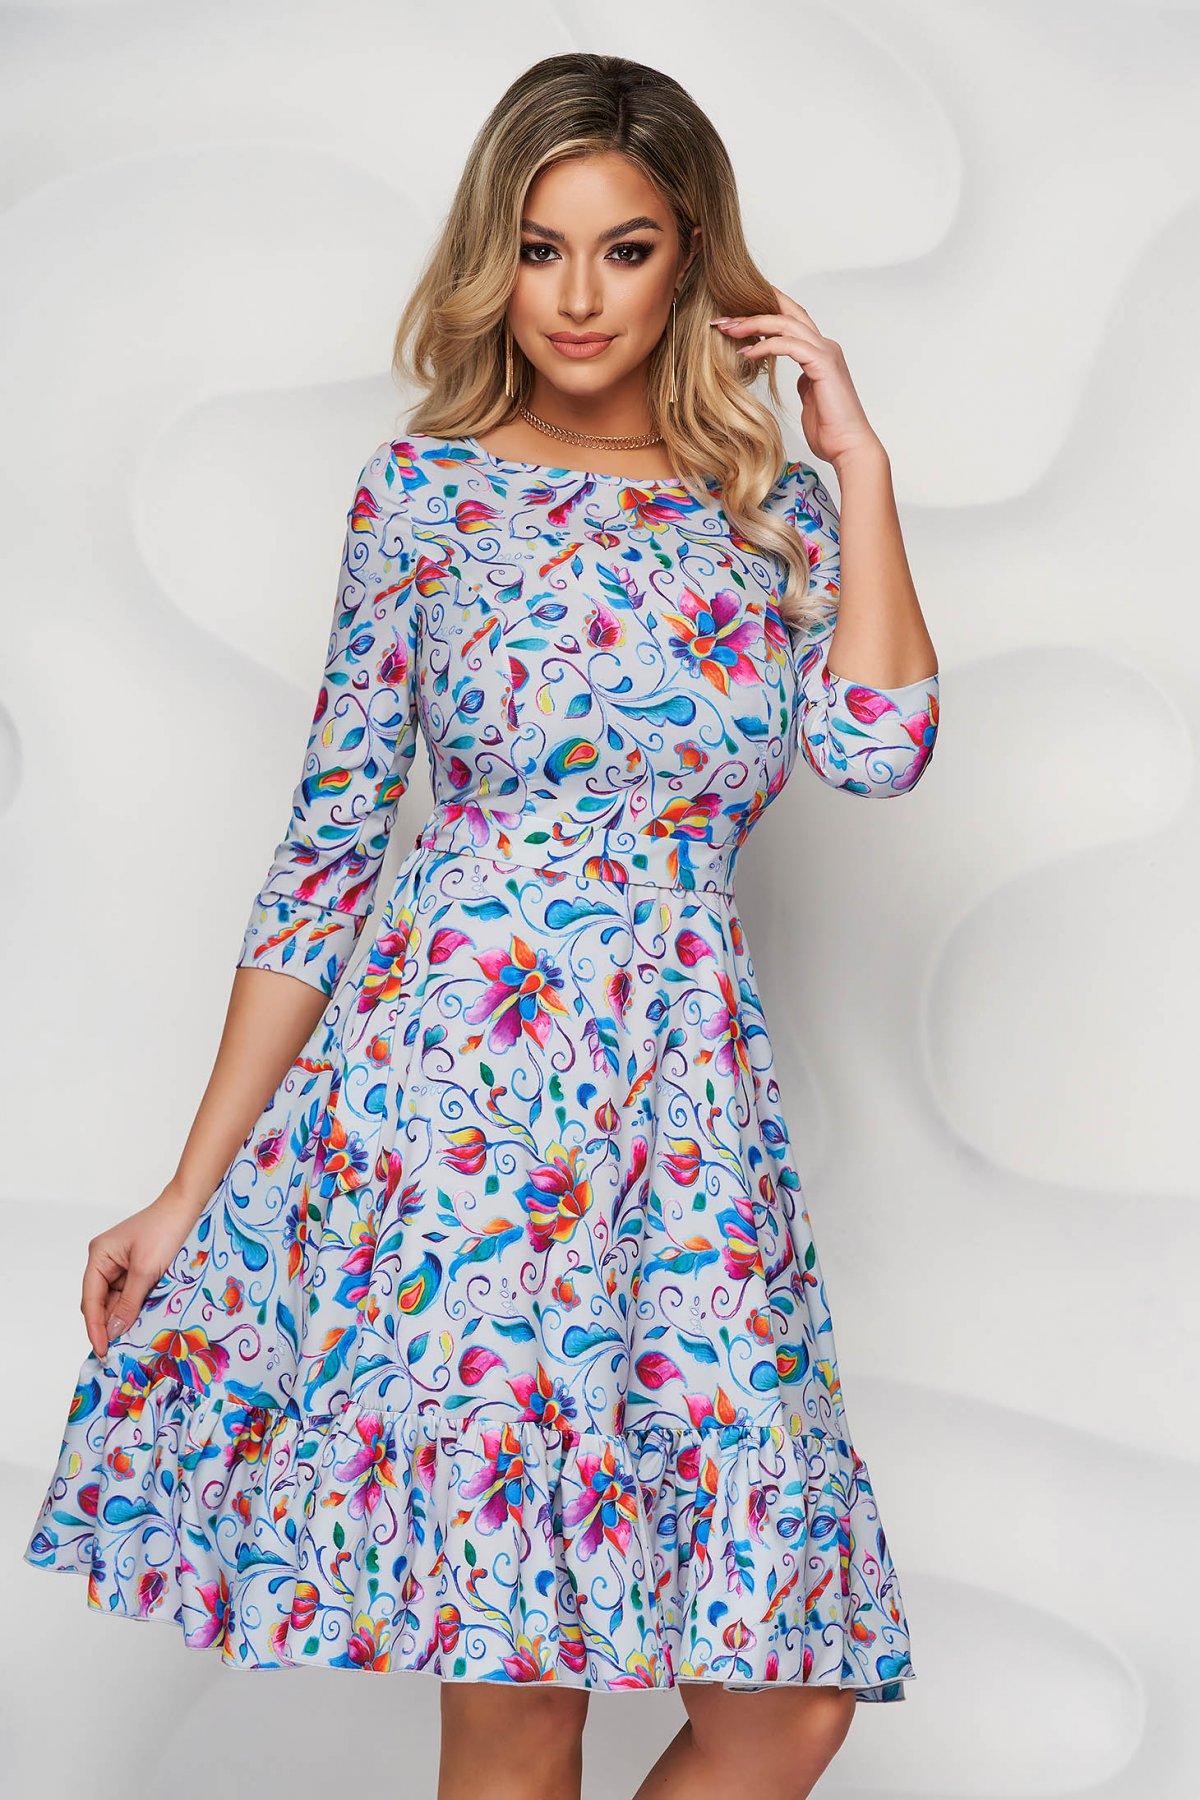 Rochie StarShinerS cu imprimeu floral in clos din material subtire cu volanase la baza rochiei - medelin.ro